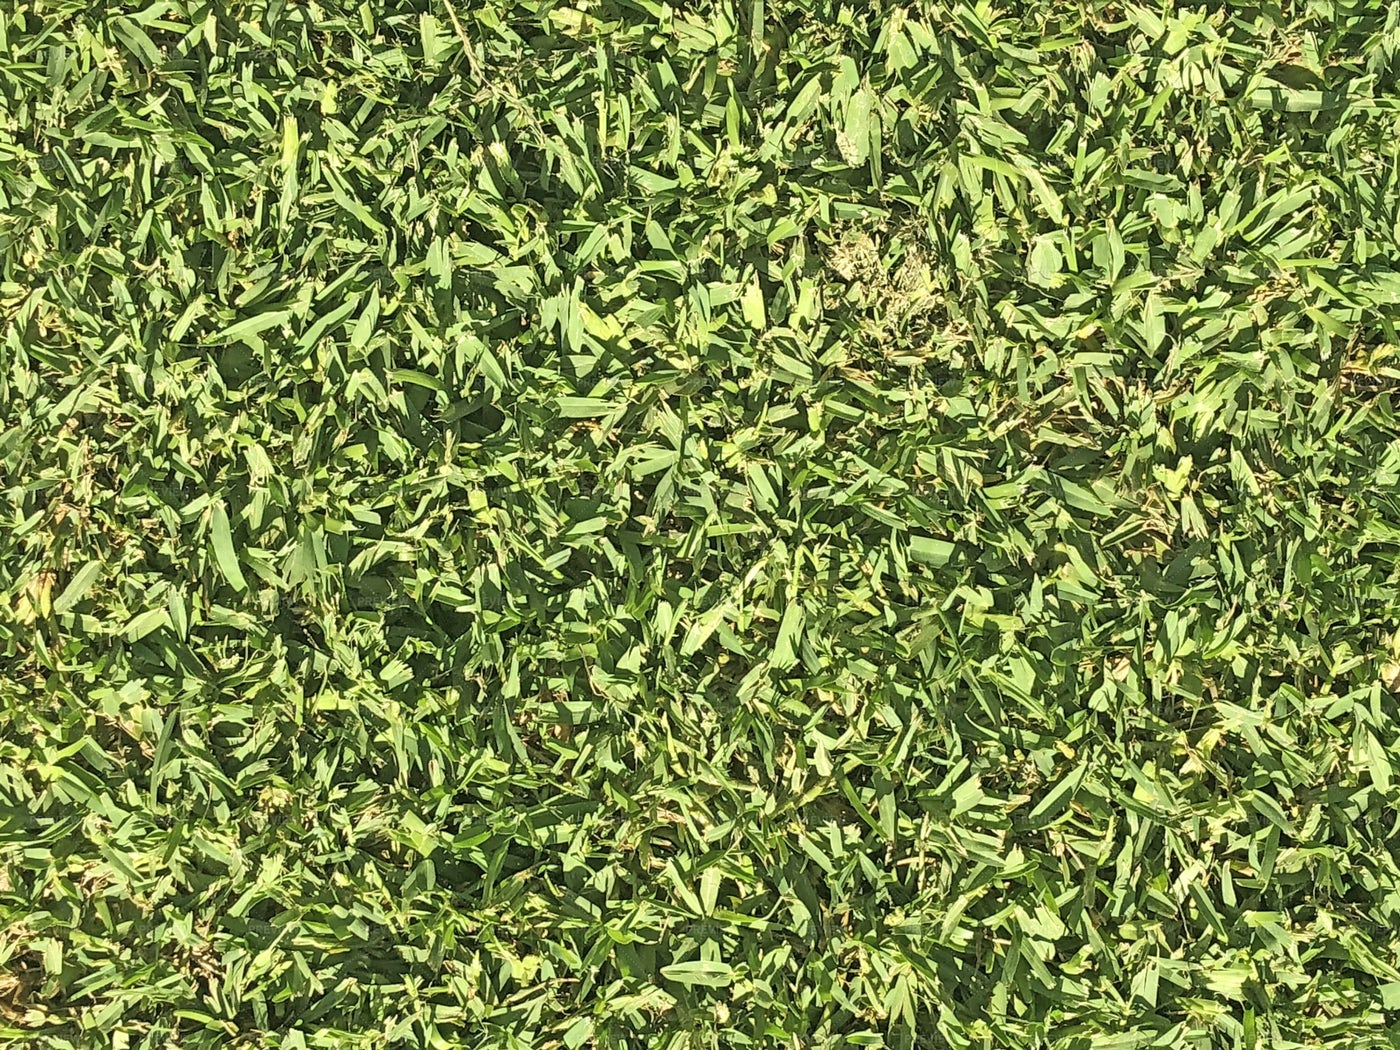 Lawn Texture: Stock Photos